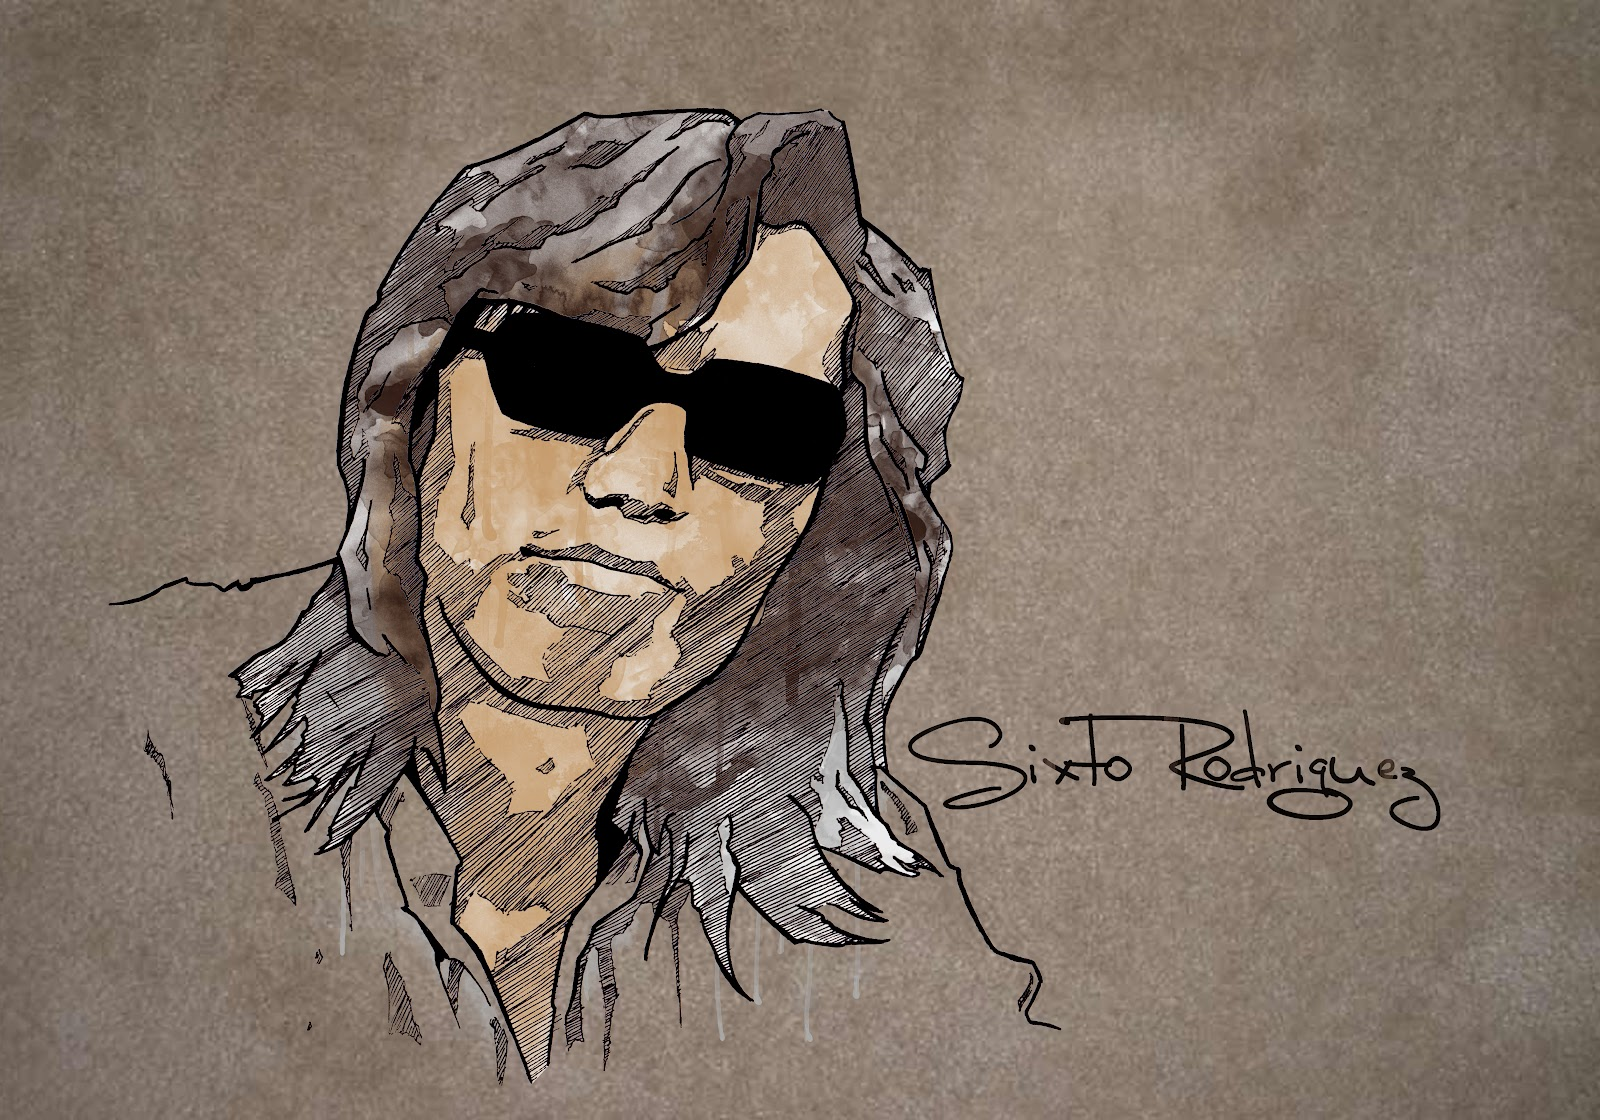 Sixto-Rodriguez-psychedelic-music-genius